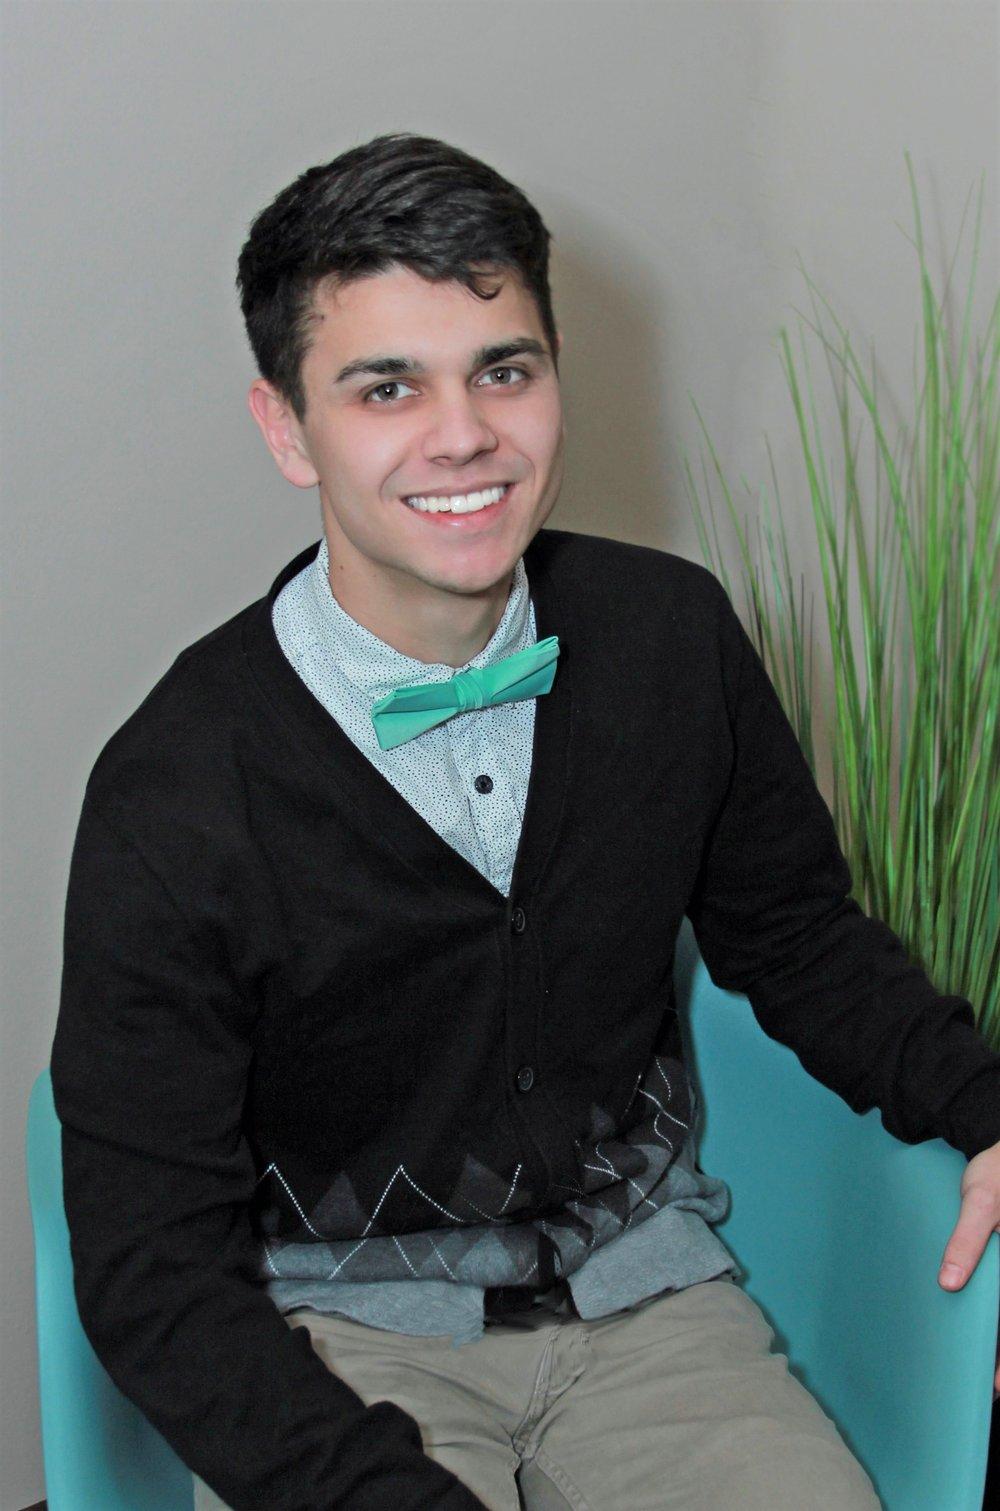 Blake Crestani  Policy Manager